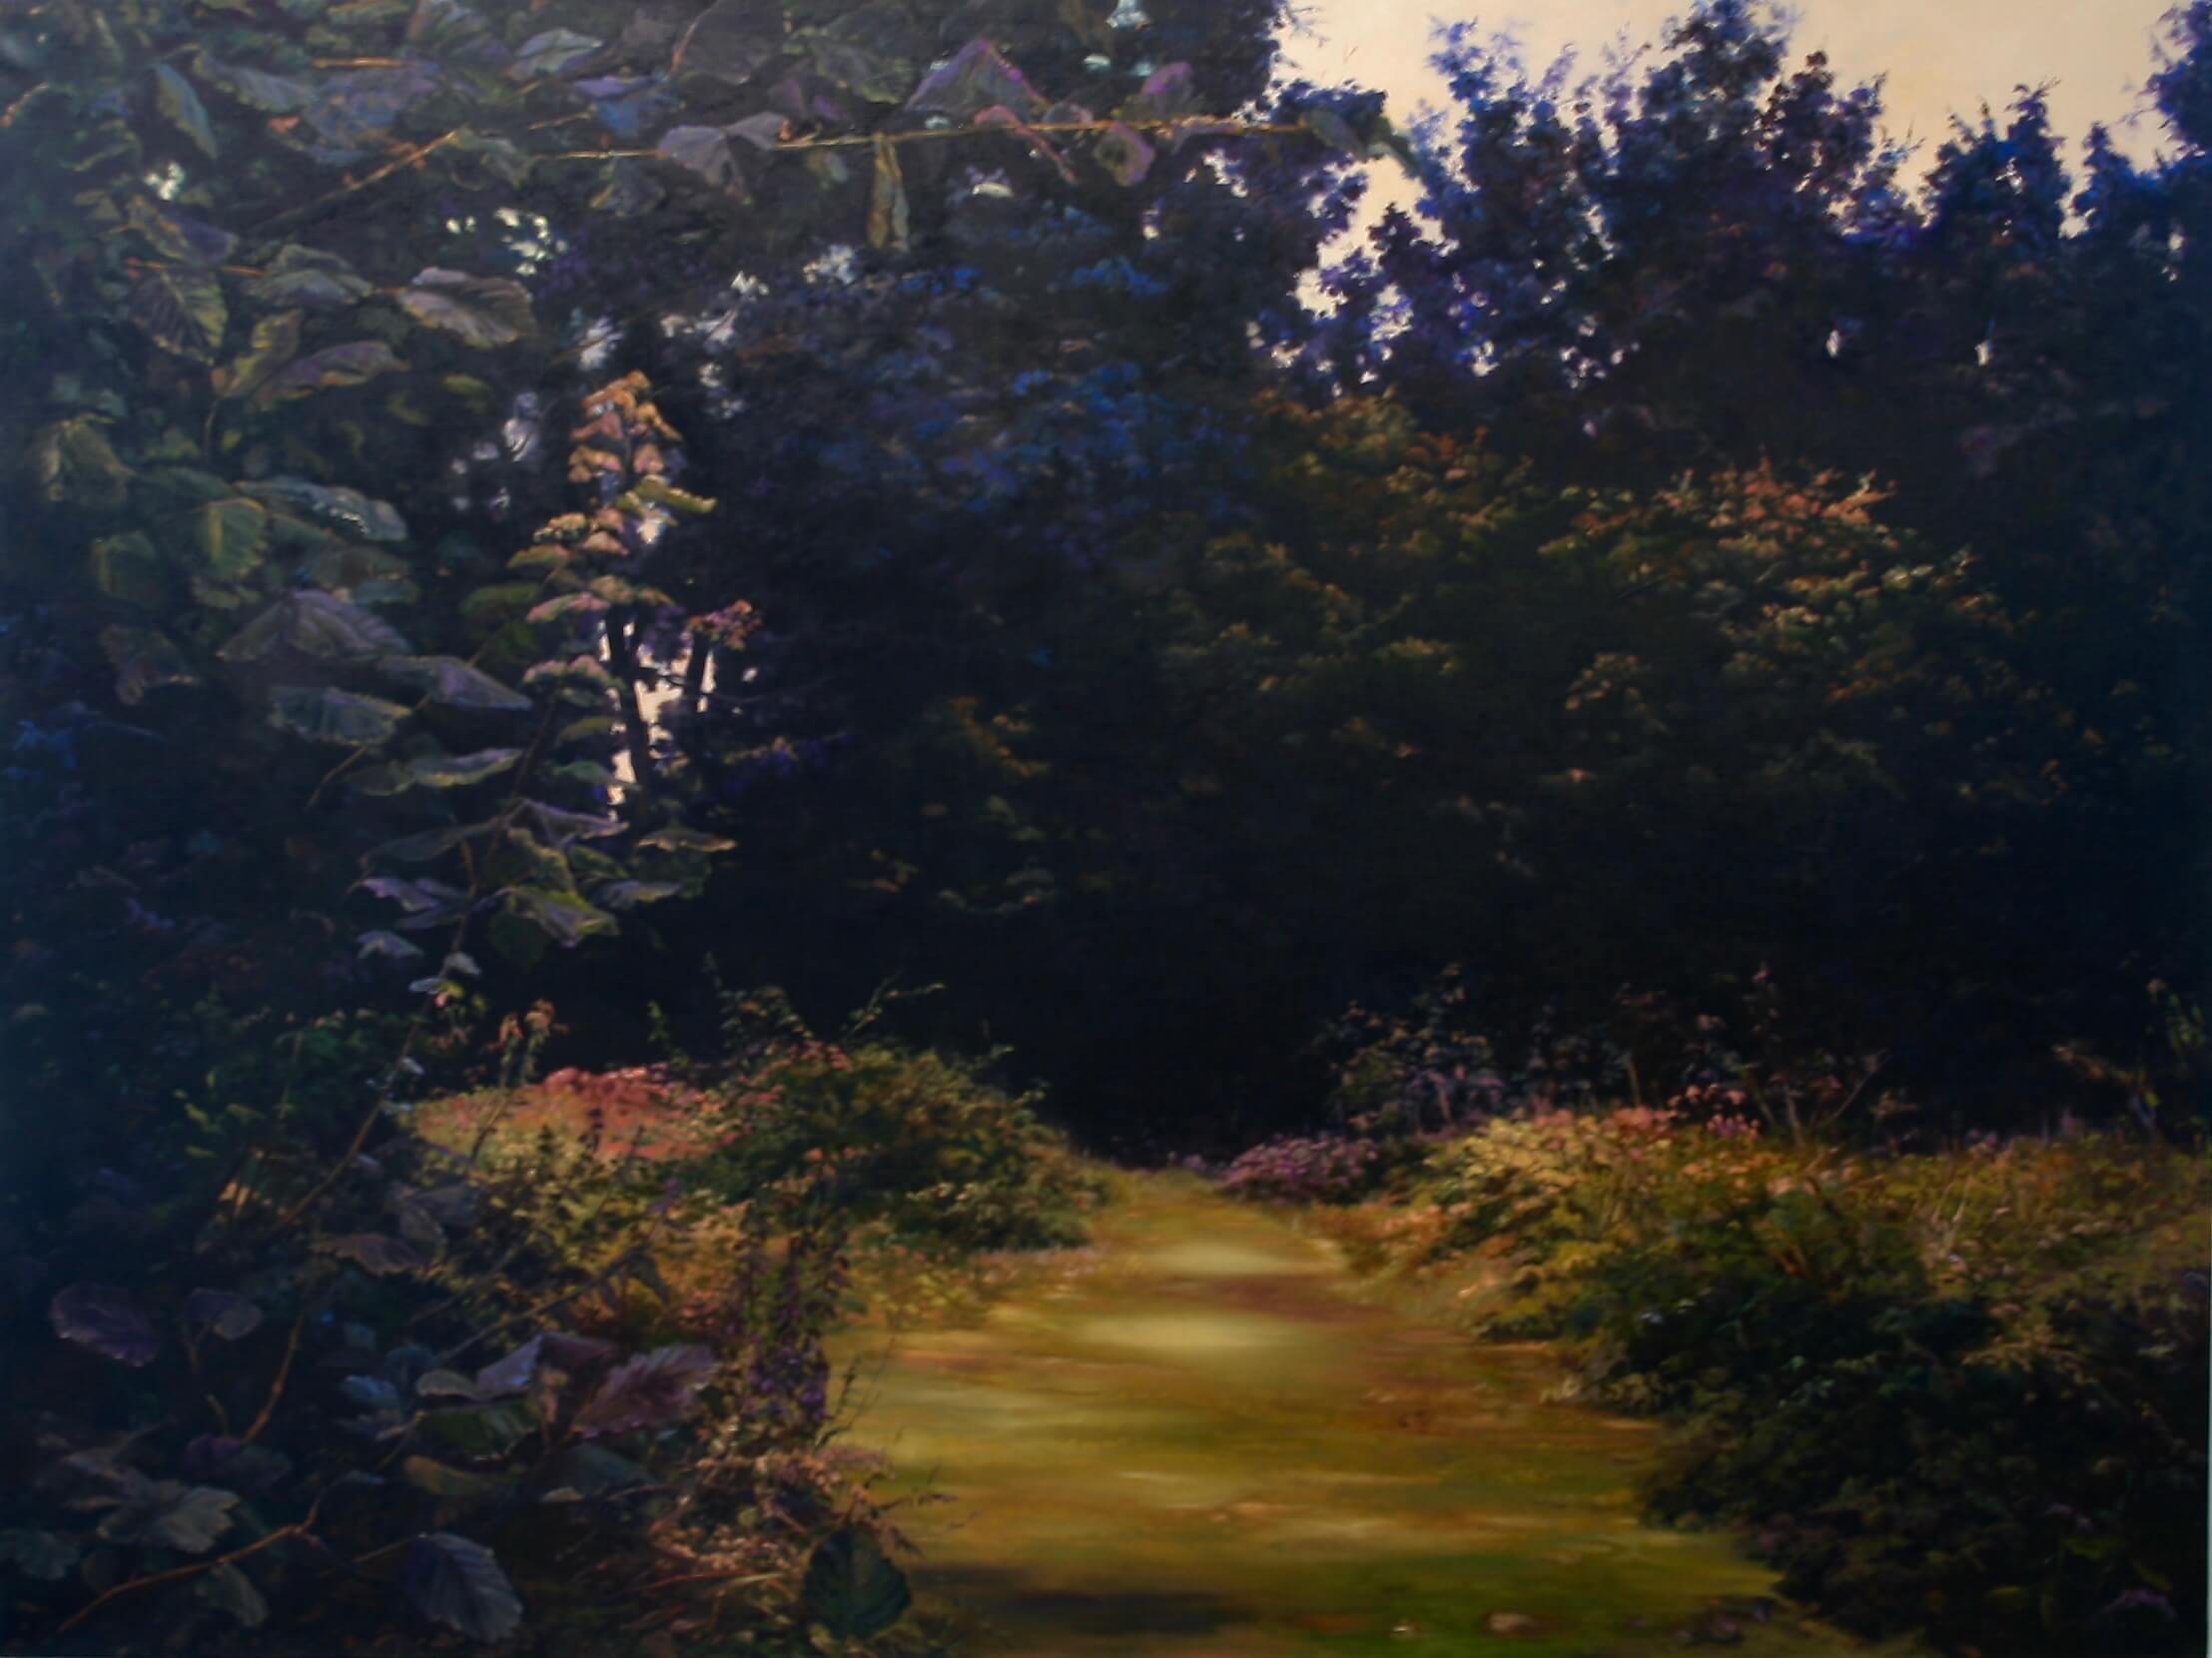 Hannah Brown, studio visit, emerging artist, painting, landscape